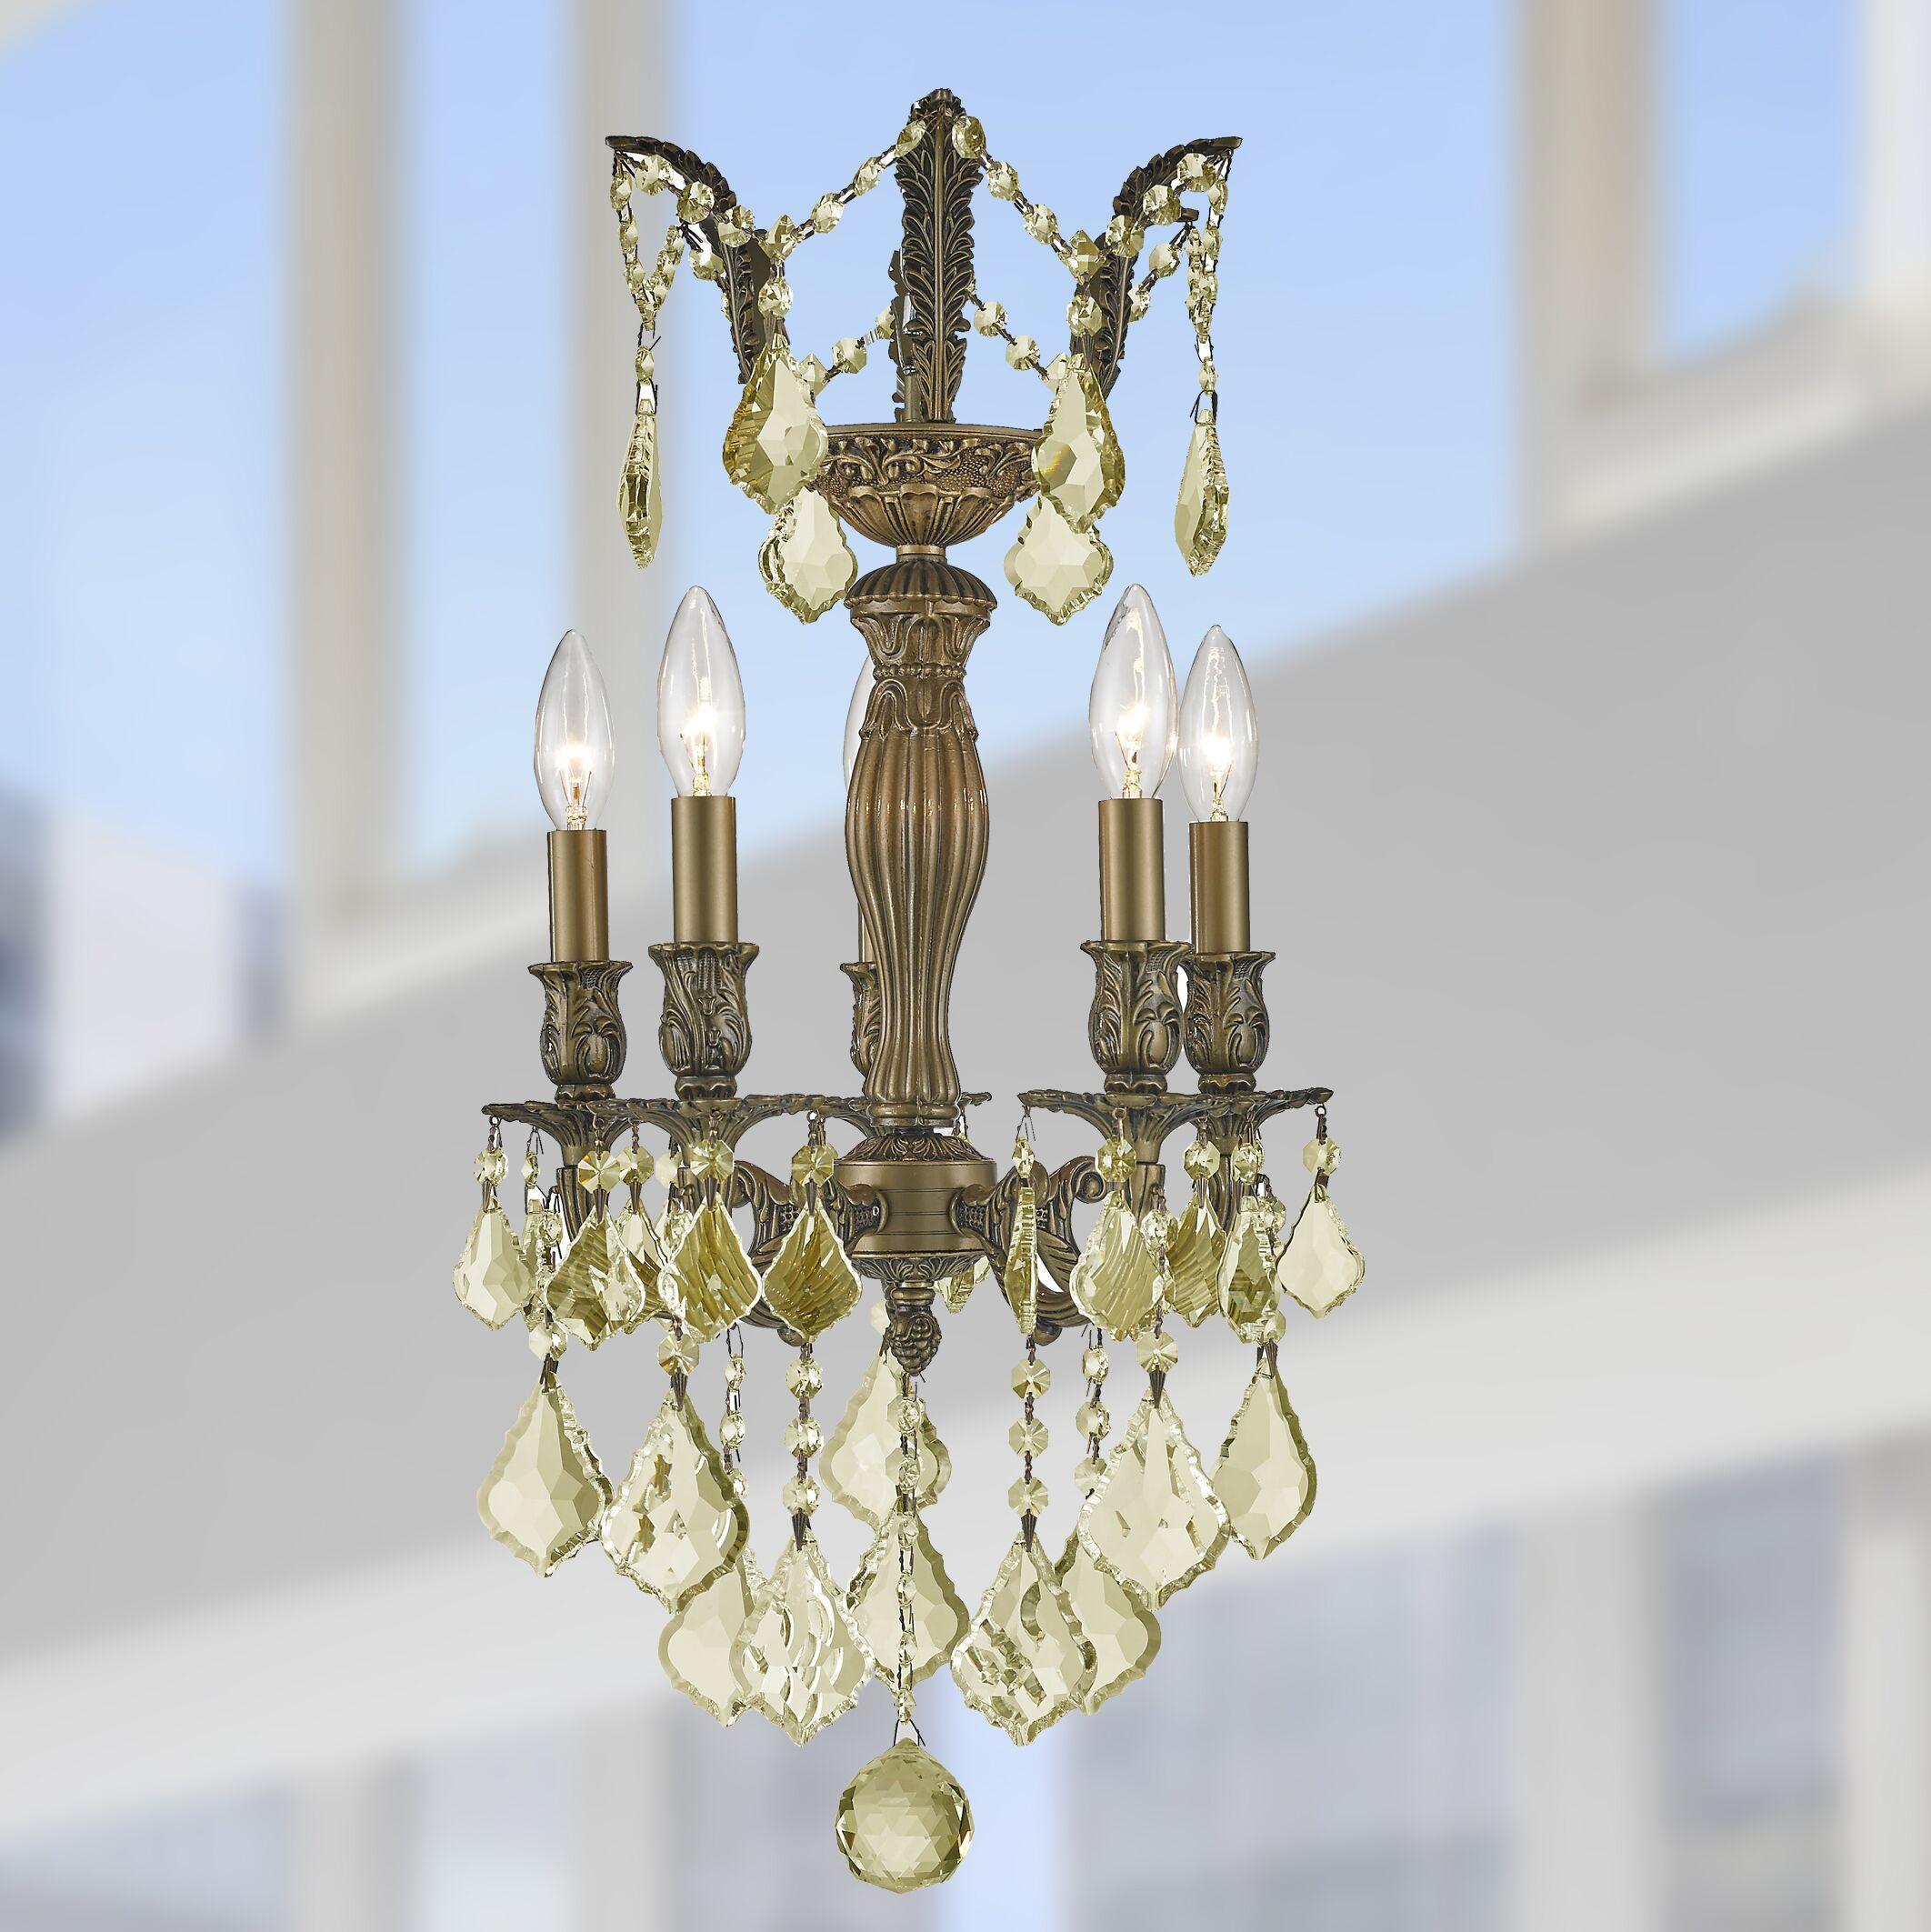 Dodson 5-Light 40W Candle Style Chandelier Finish: Antique Bronze